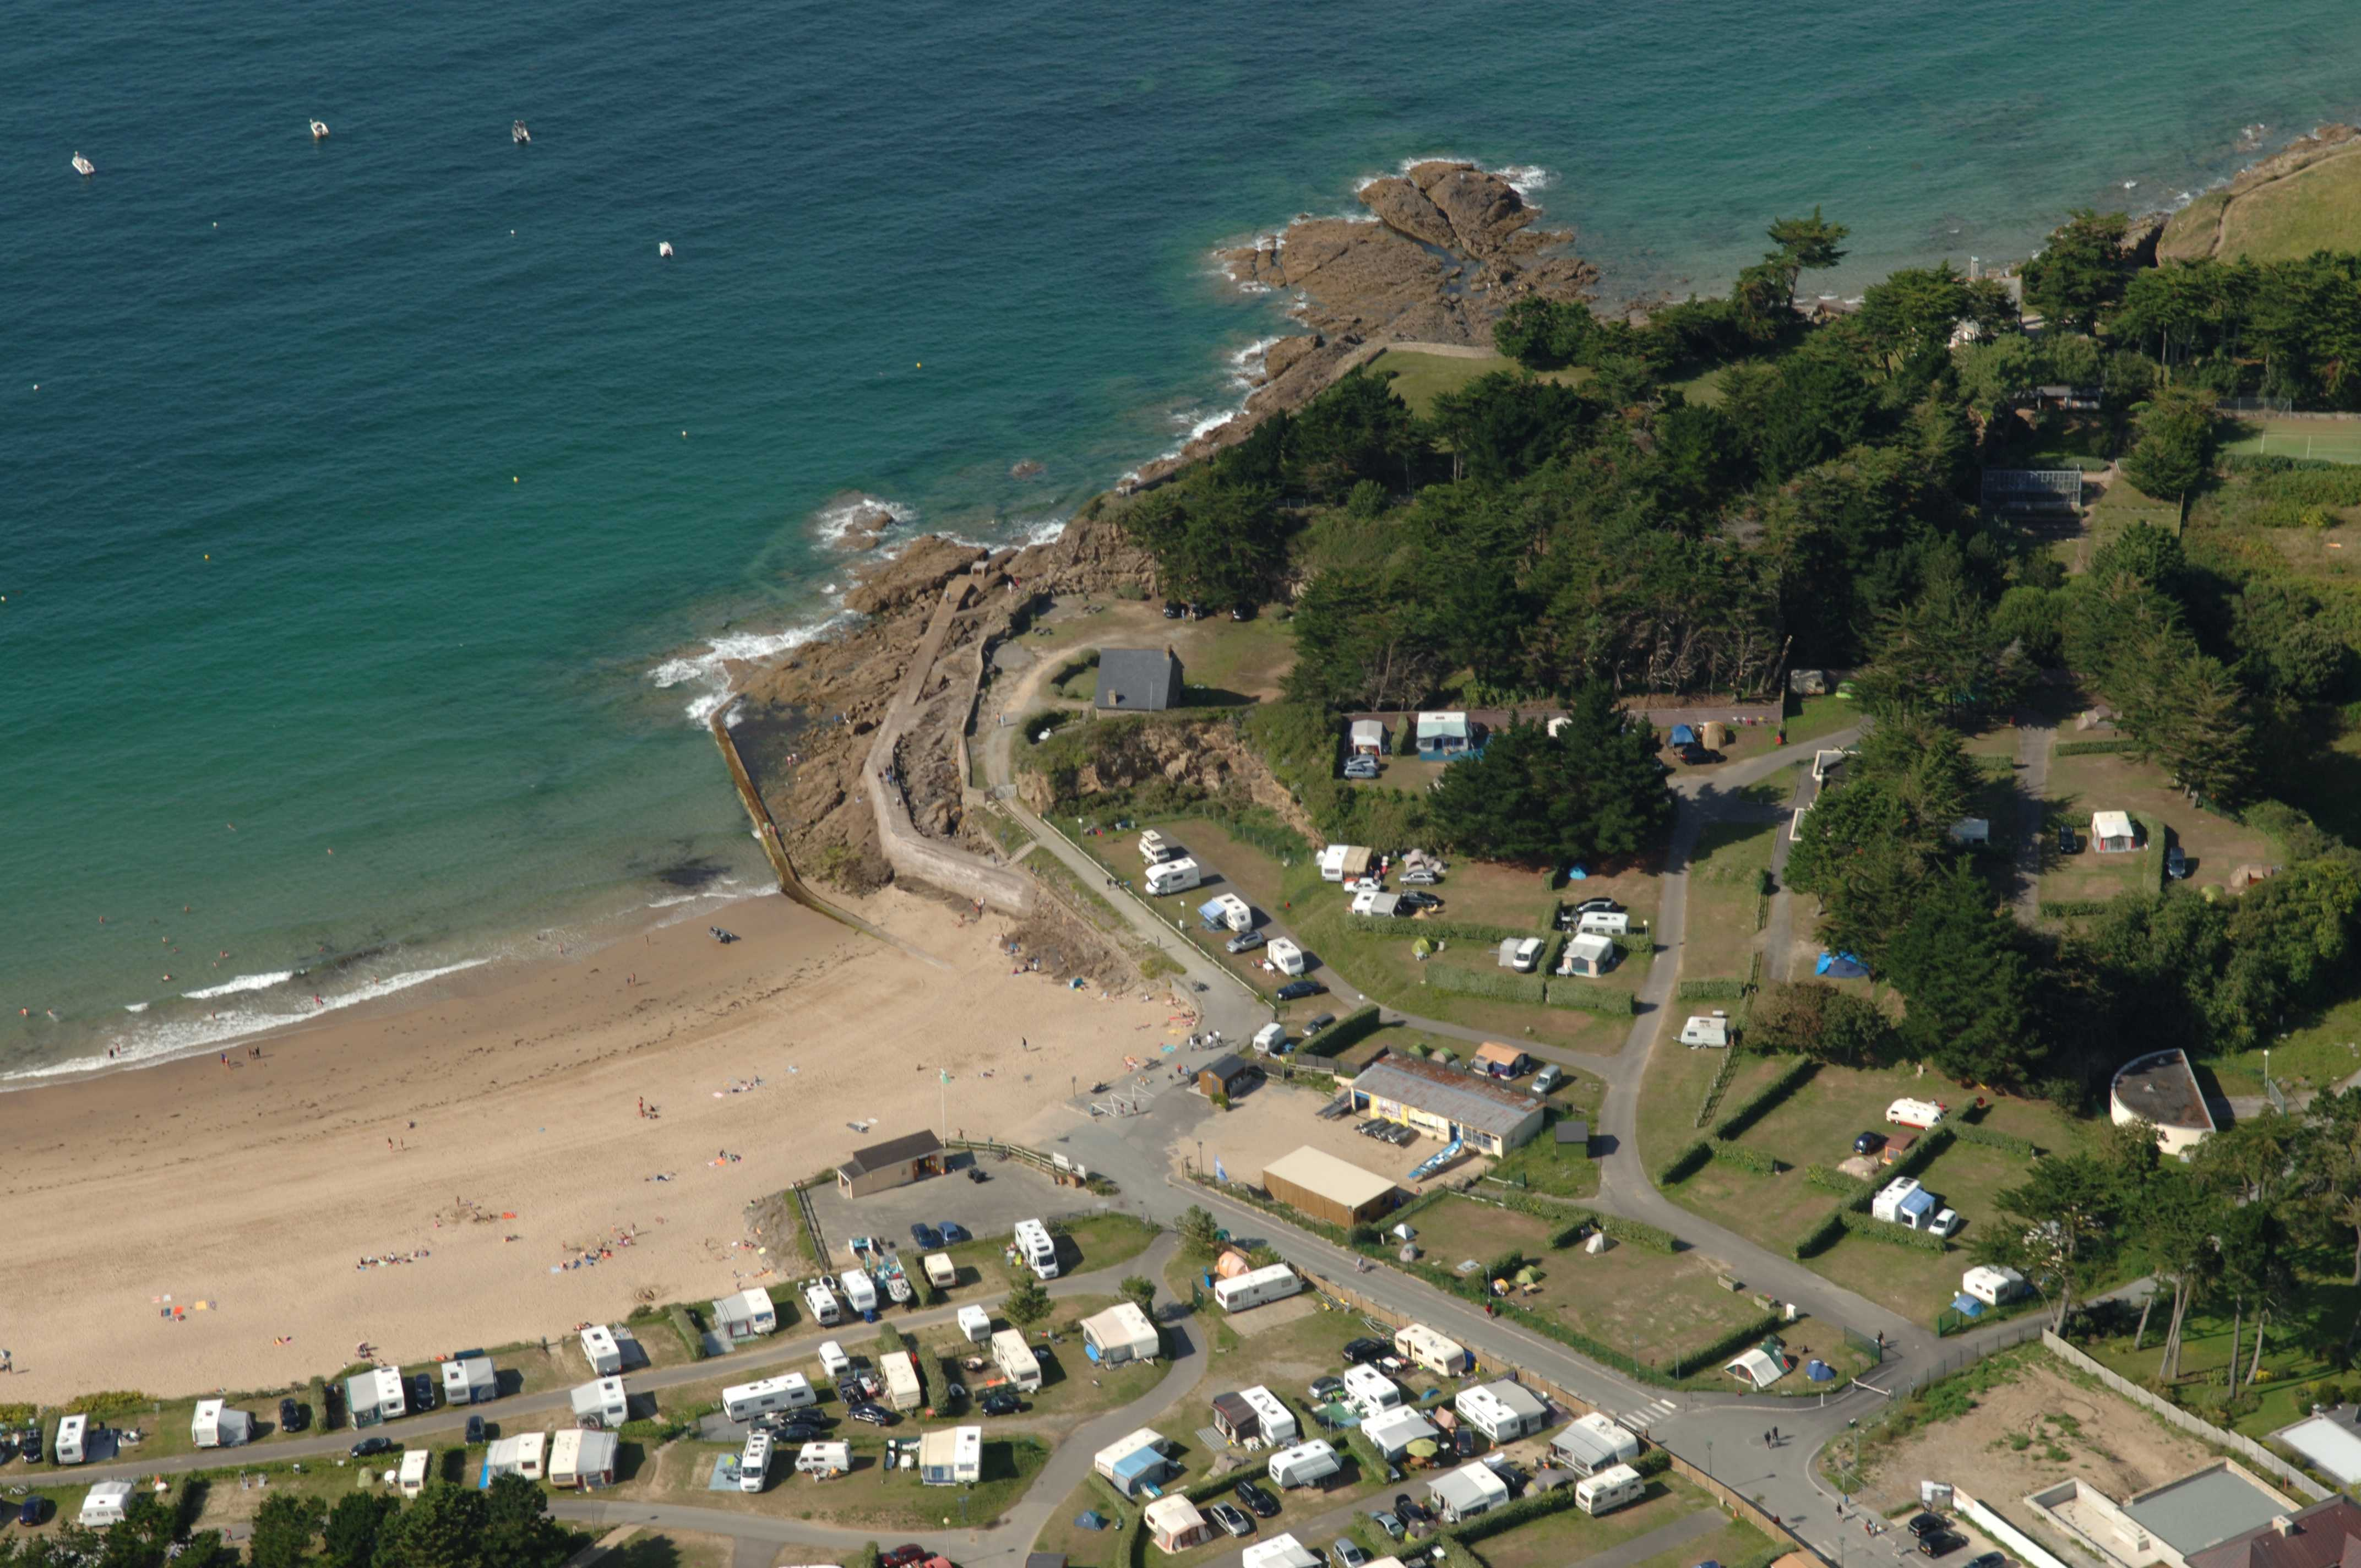 Camping le port blanc - Camping le port blanc dinard ...